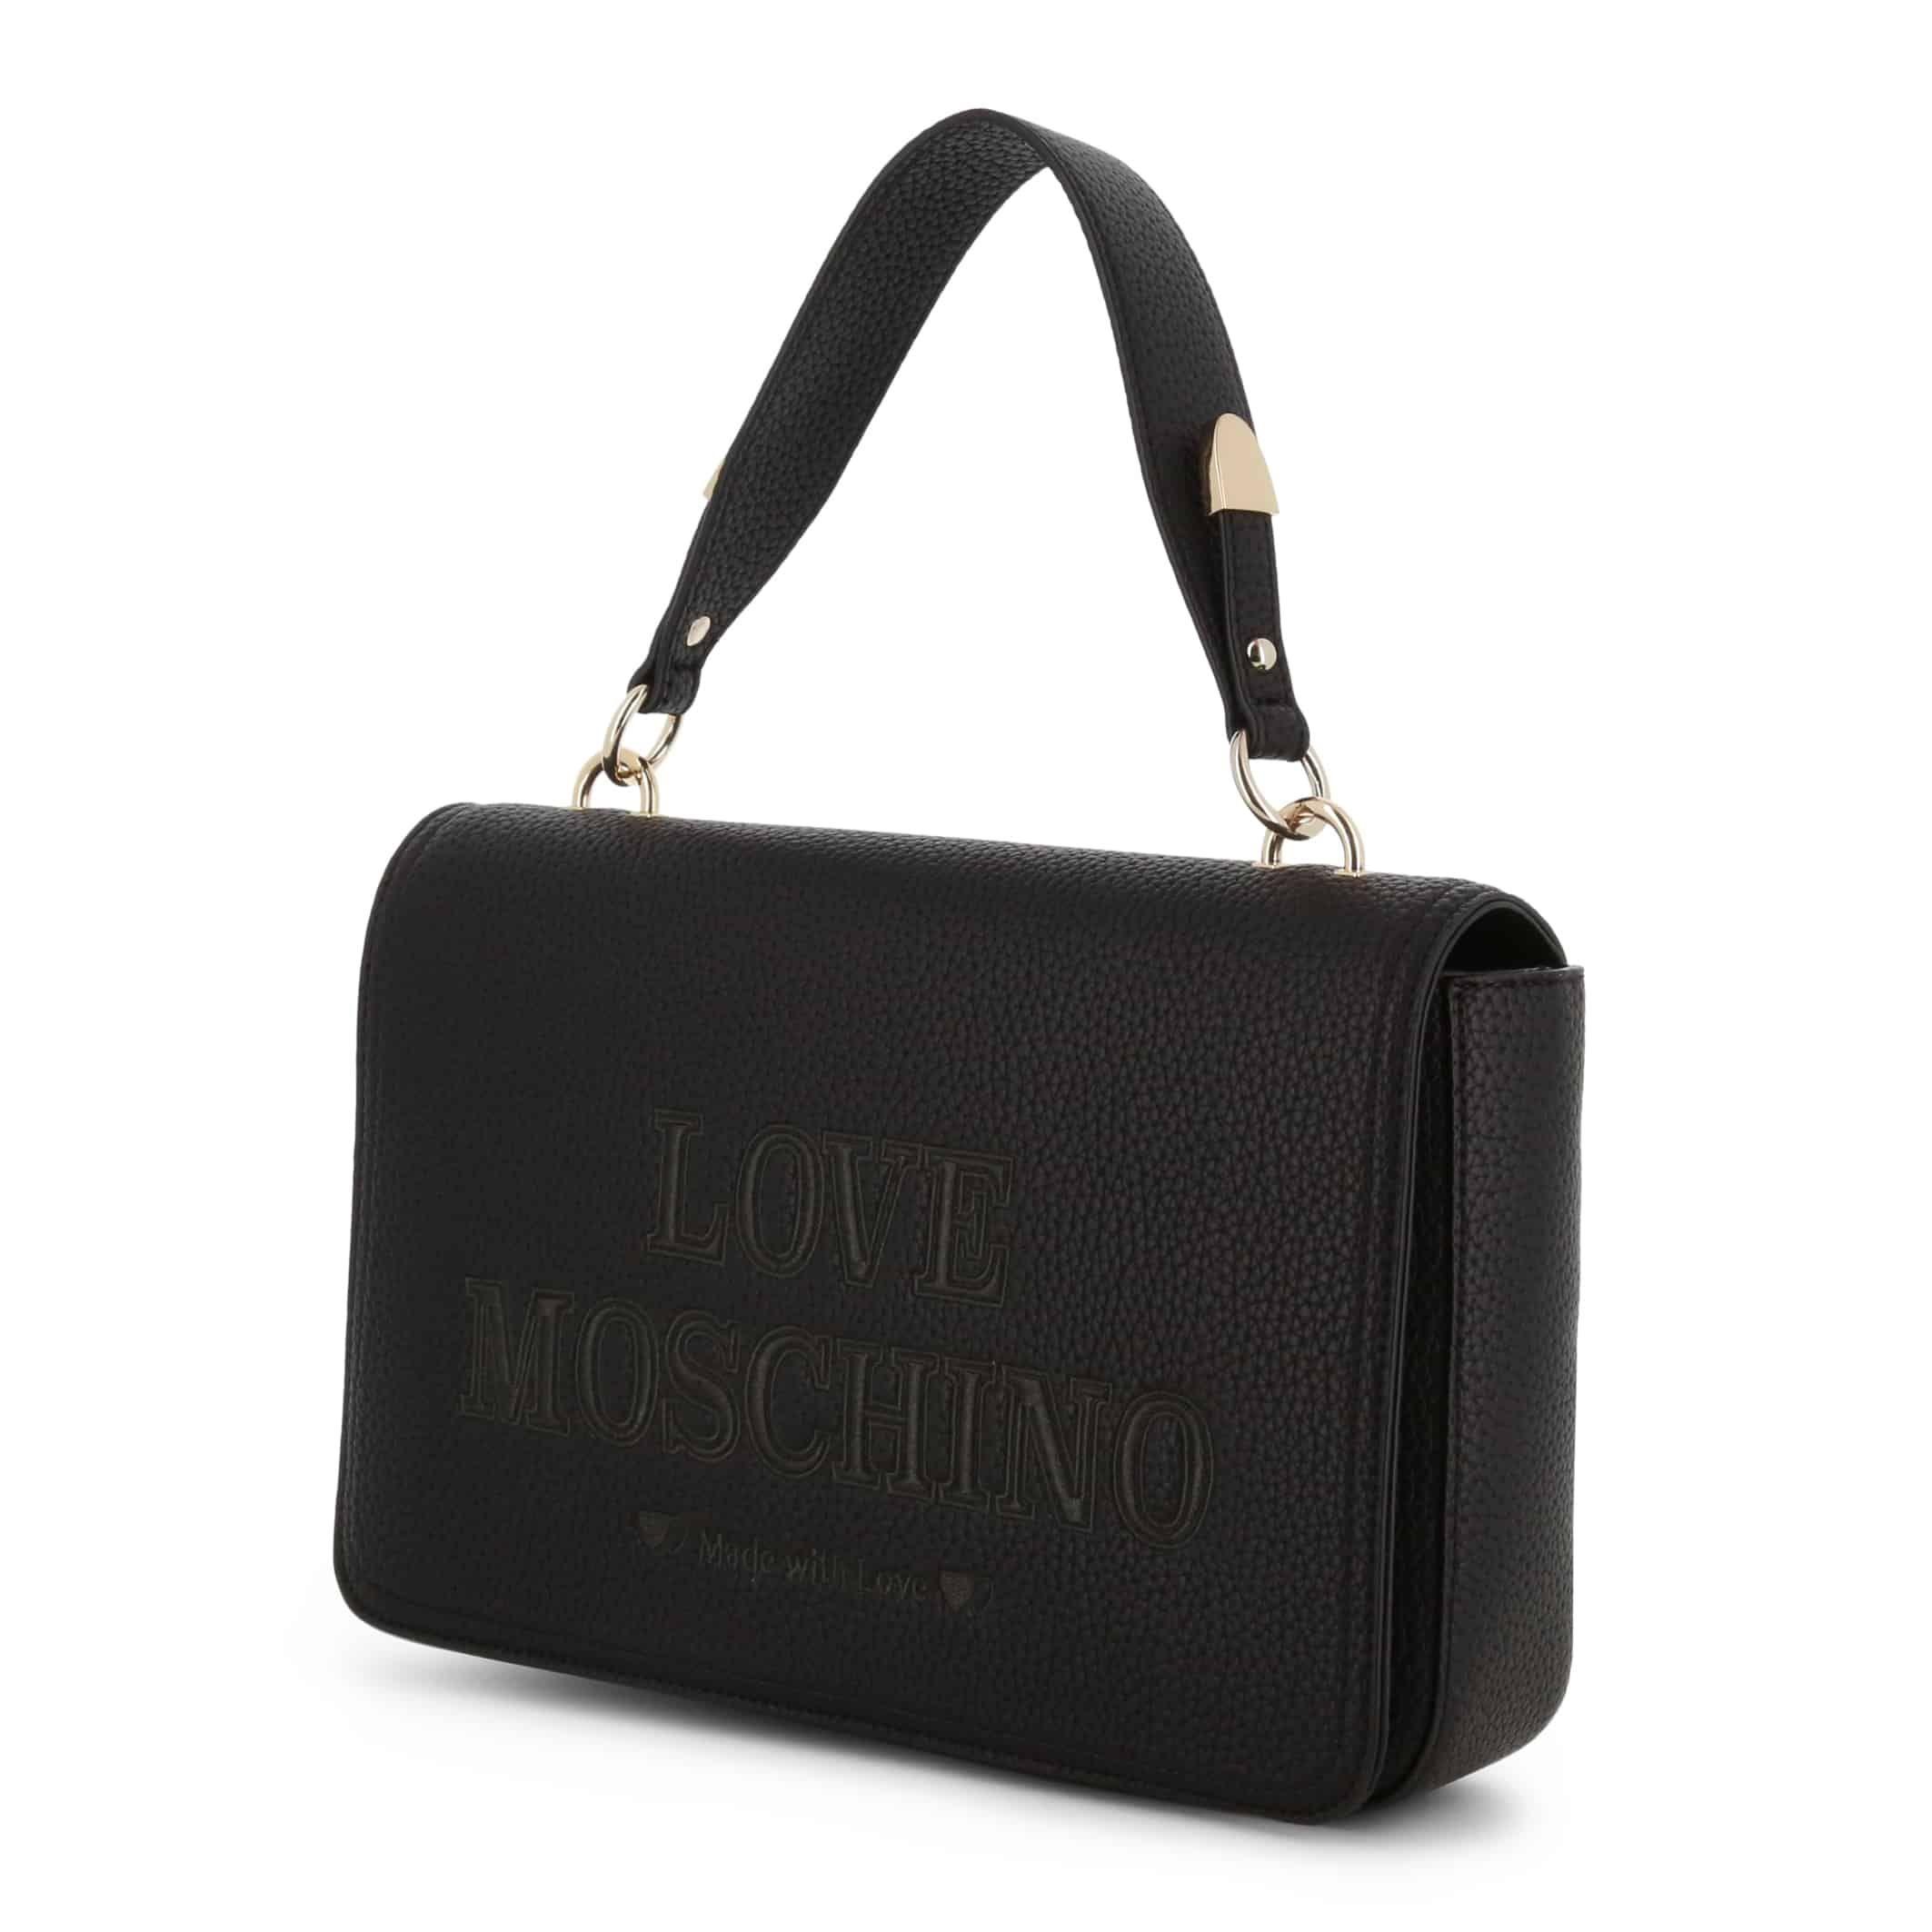 Love Moschino – JC4288PP08KN – Zwart Designeritems.nl